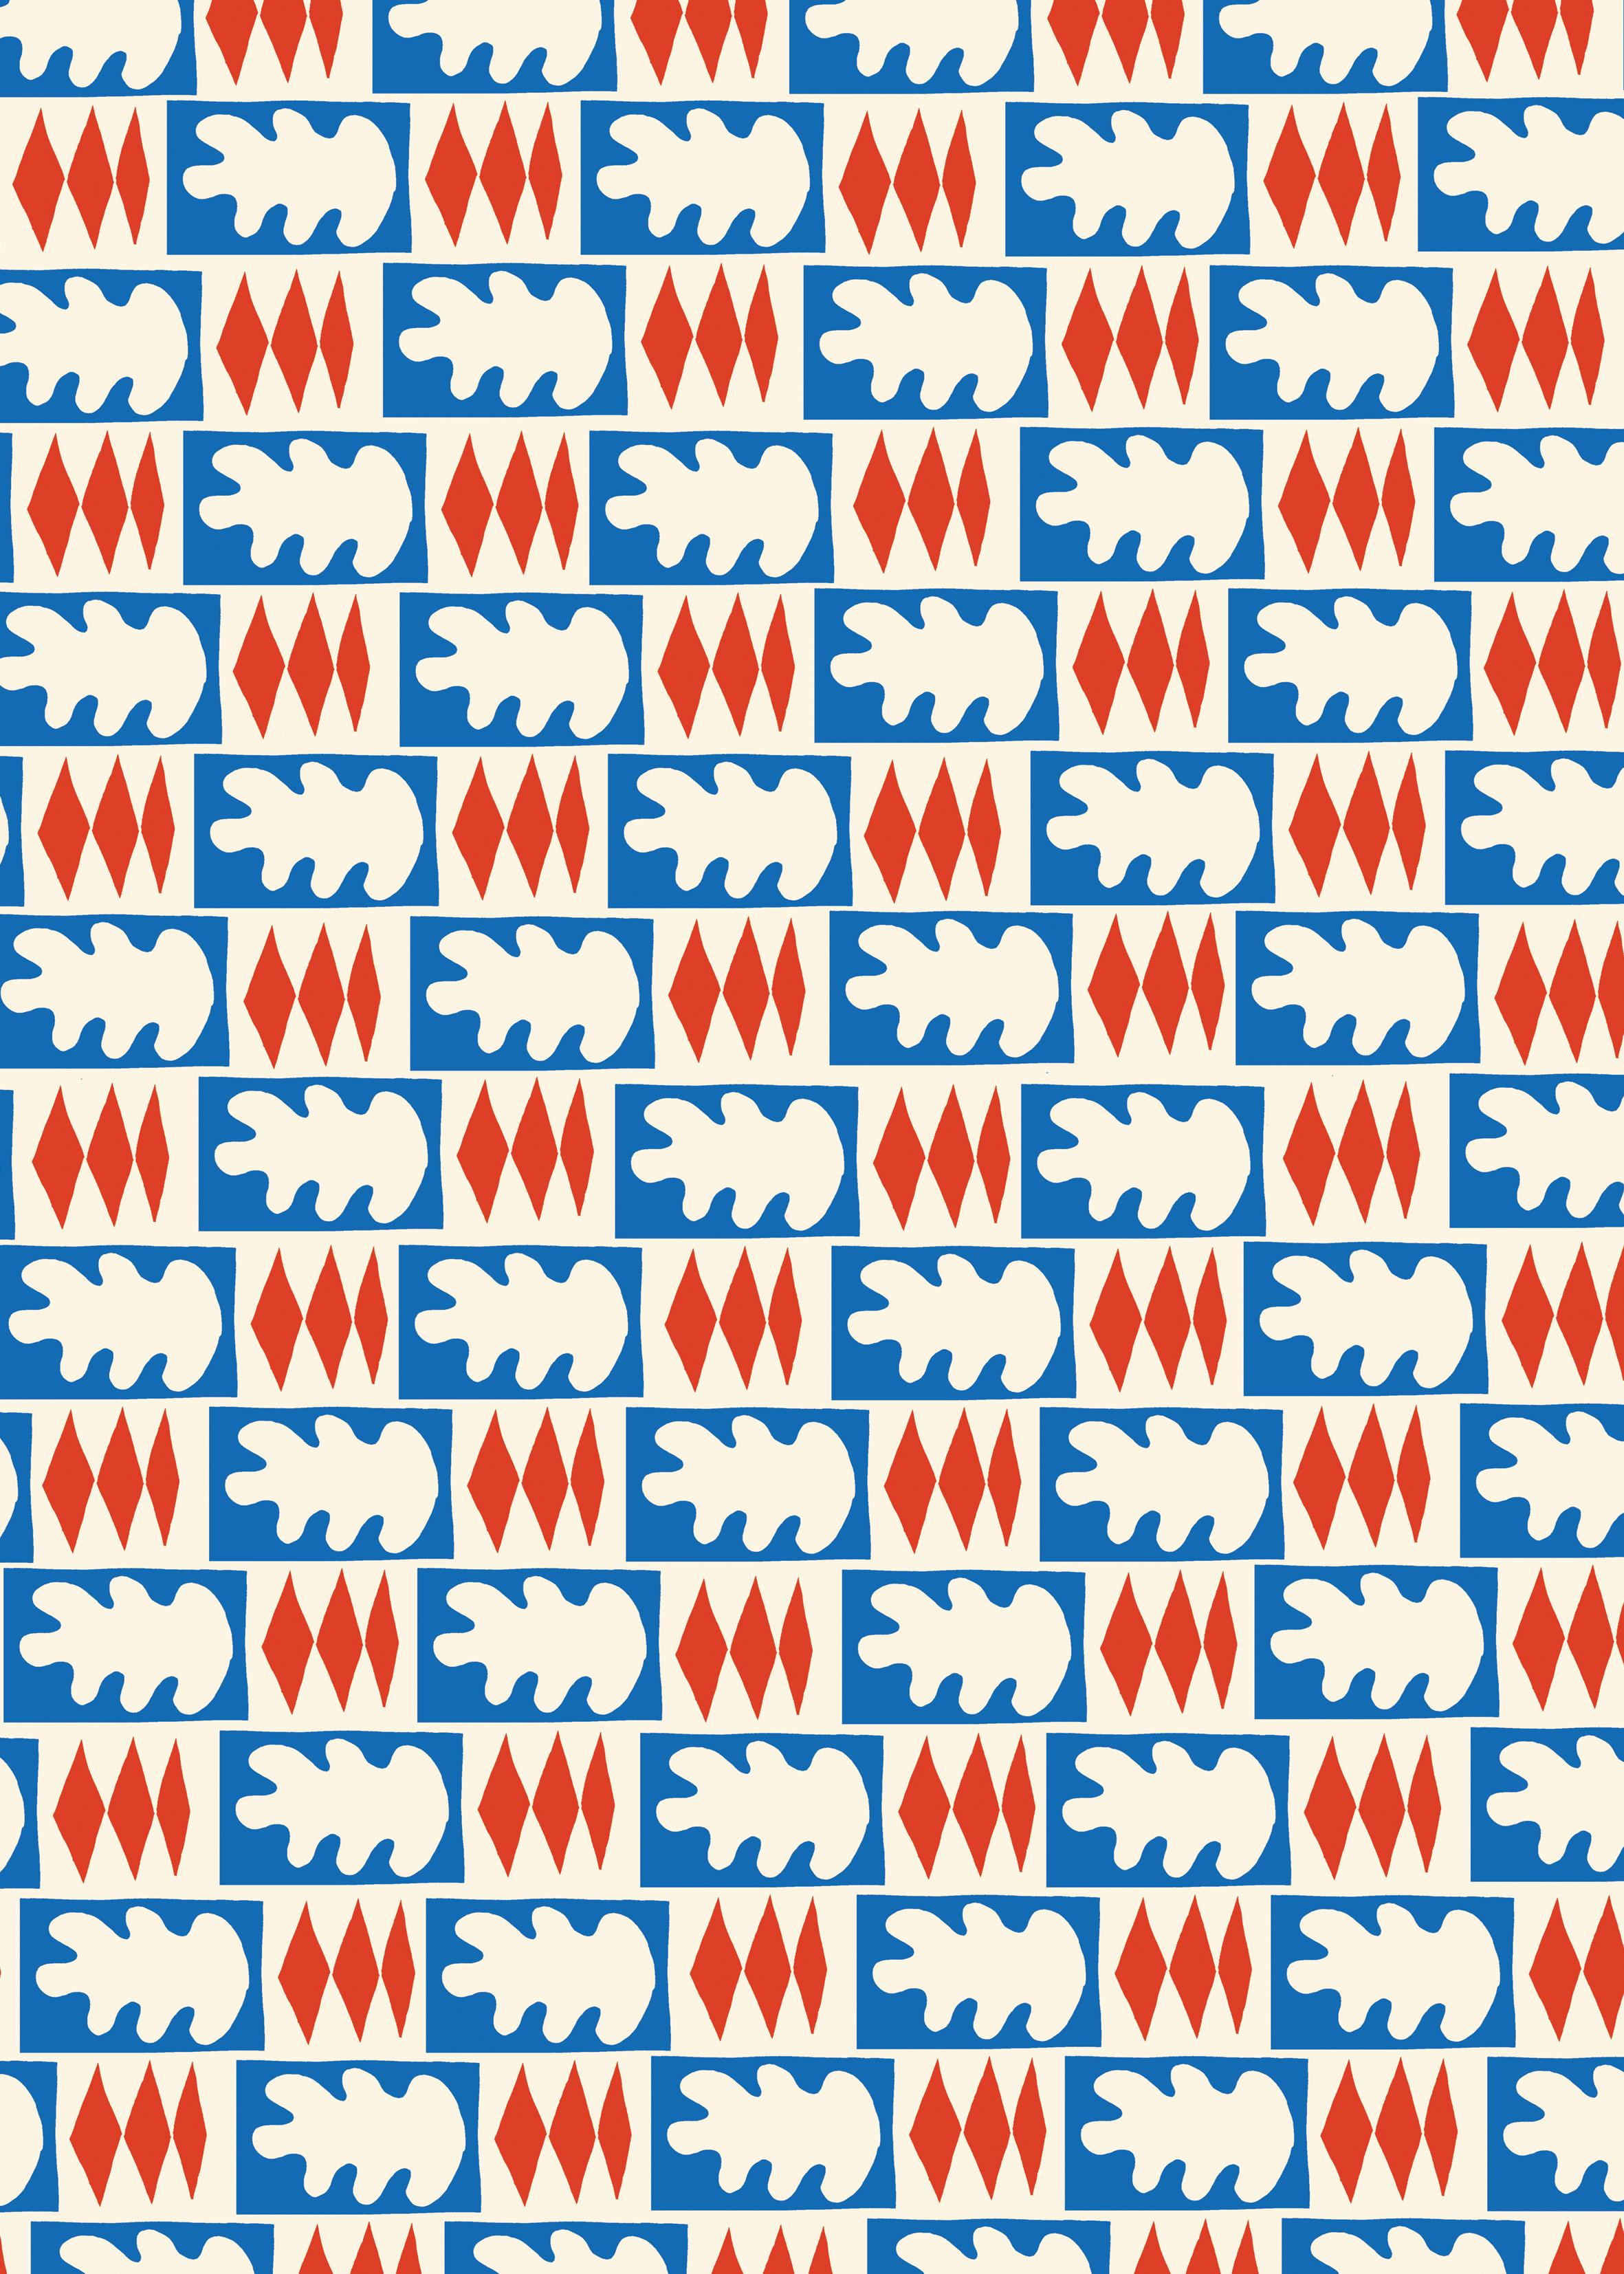 HelloMarine-pattern2.jpg